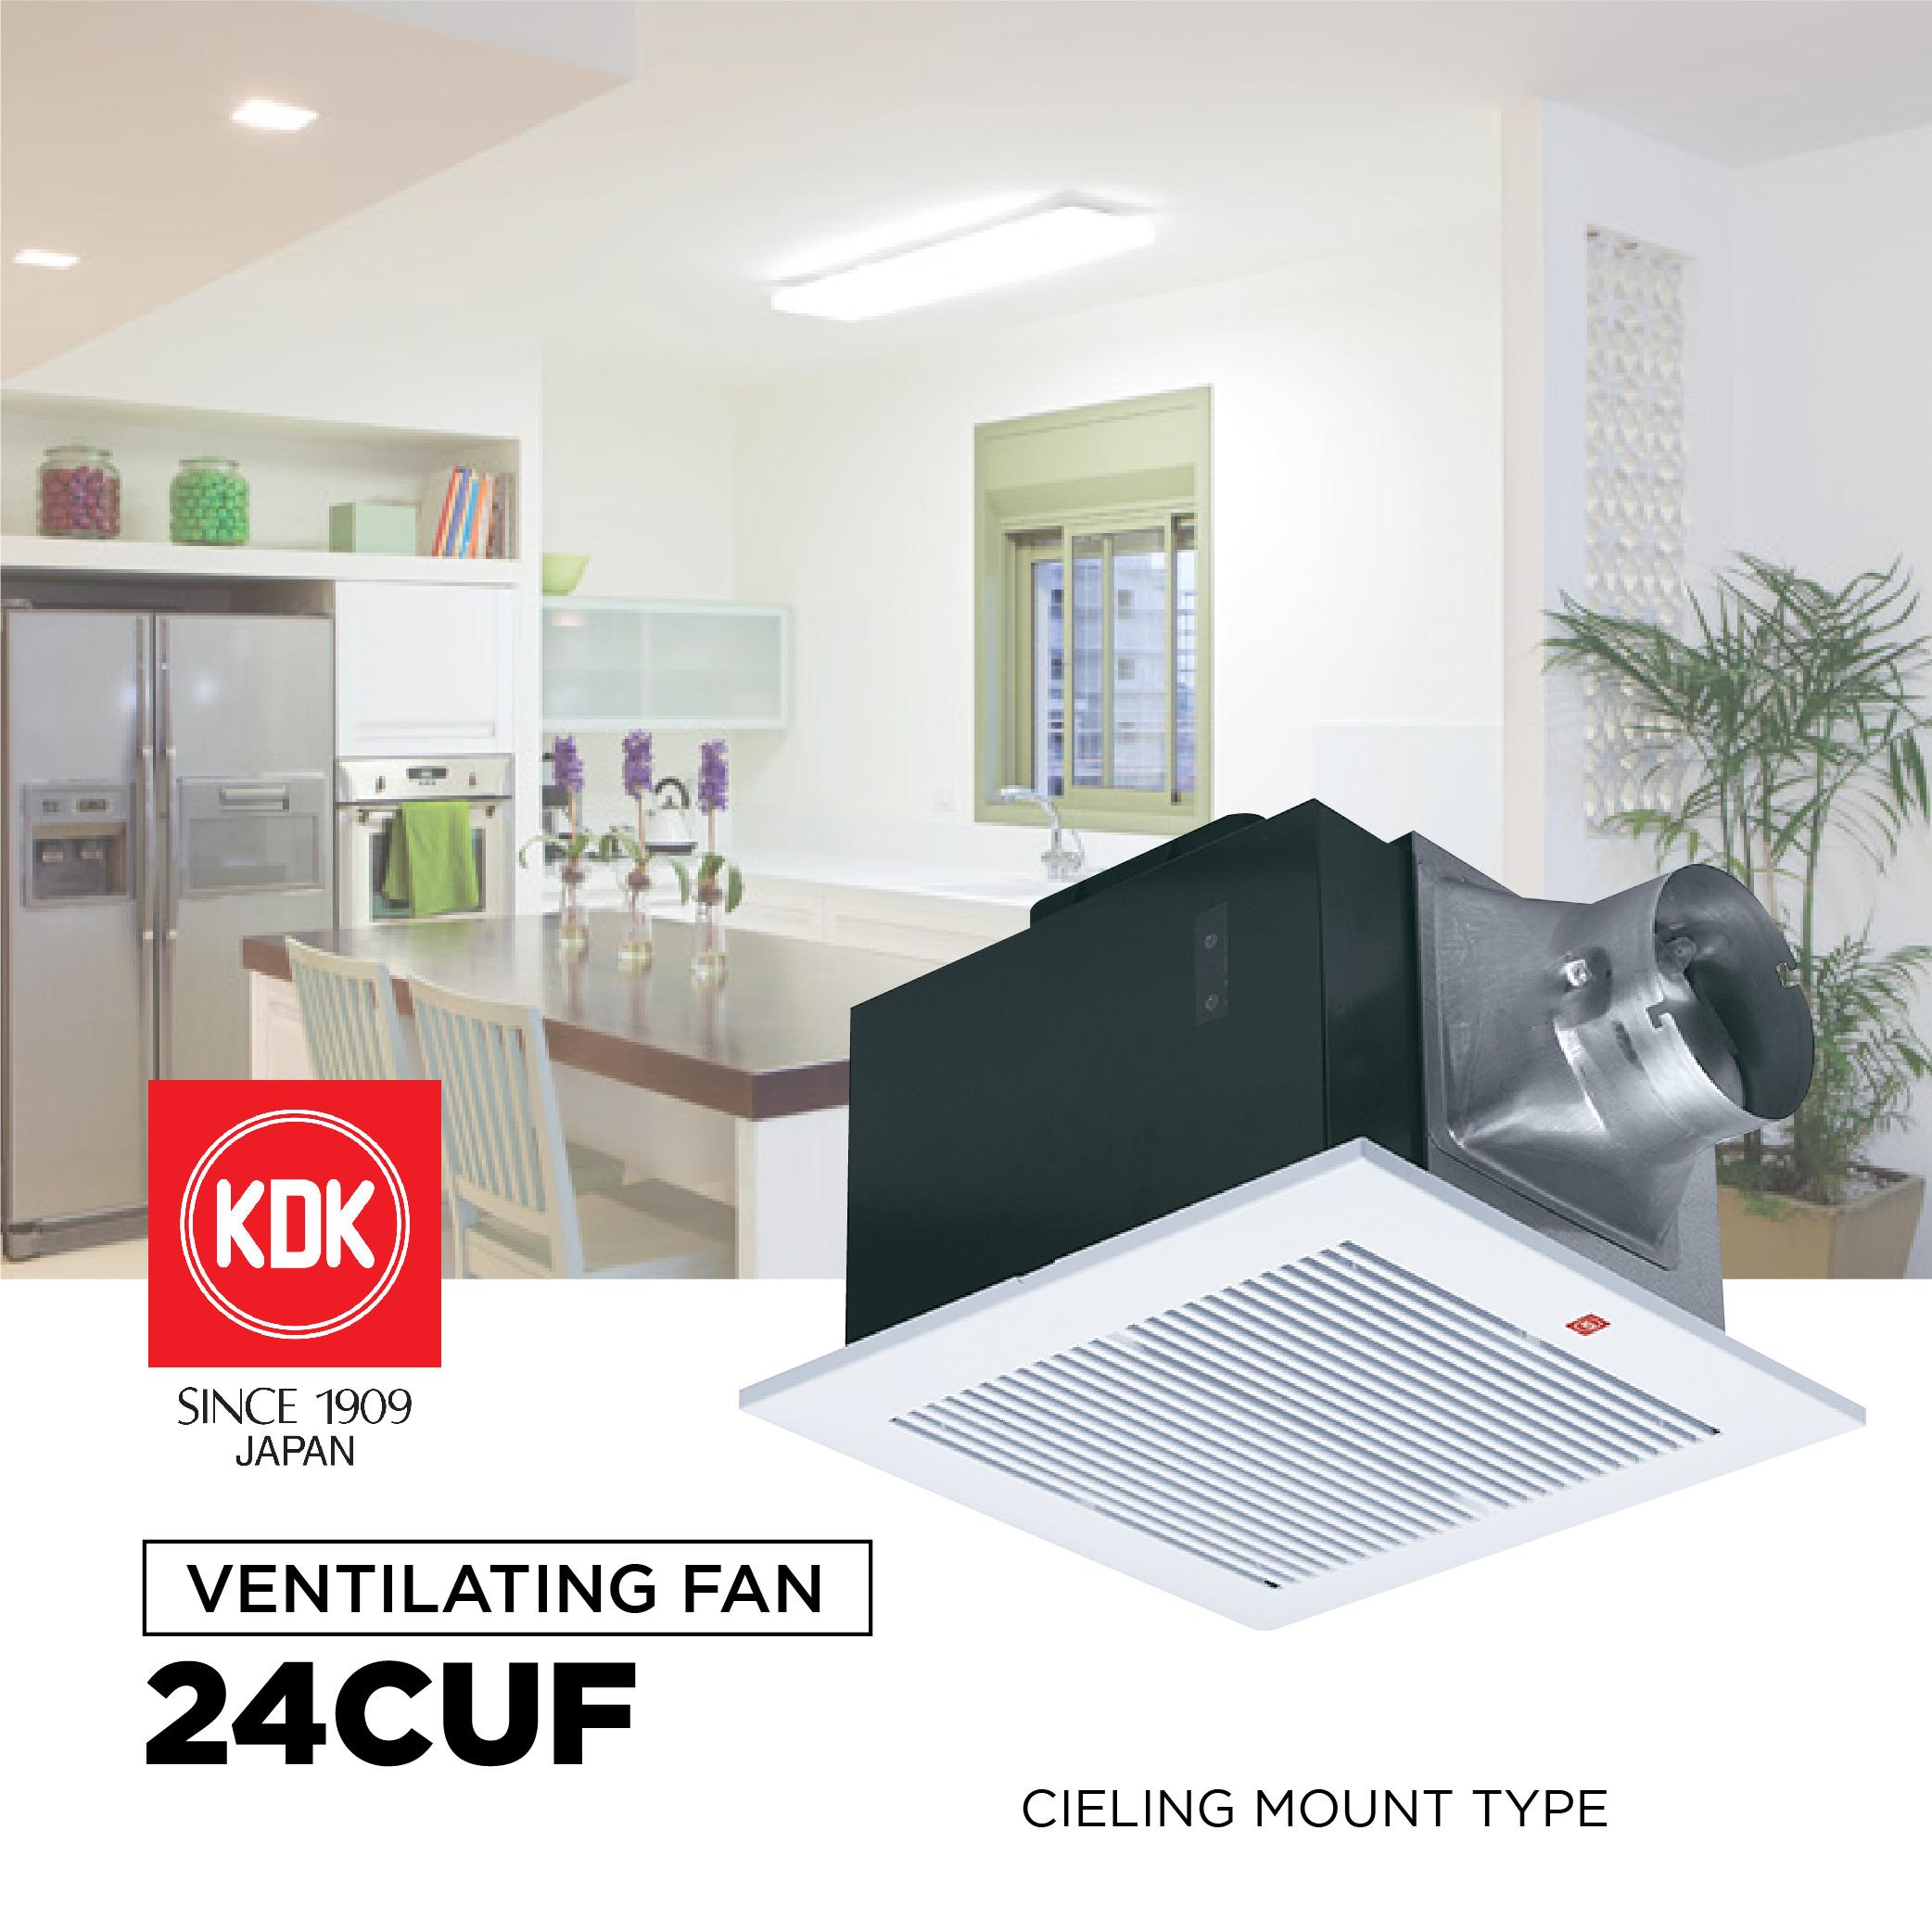 "KDK 24CUF 10"" Ceiling Mount Type Ventilating Fan | Lazada PH"